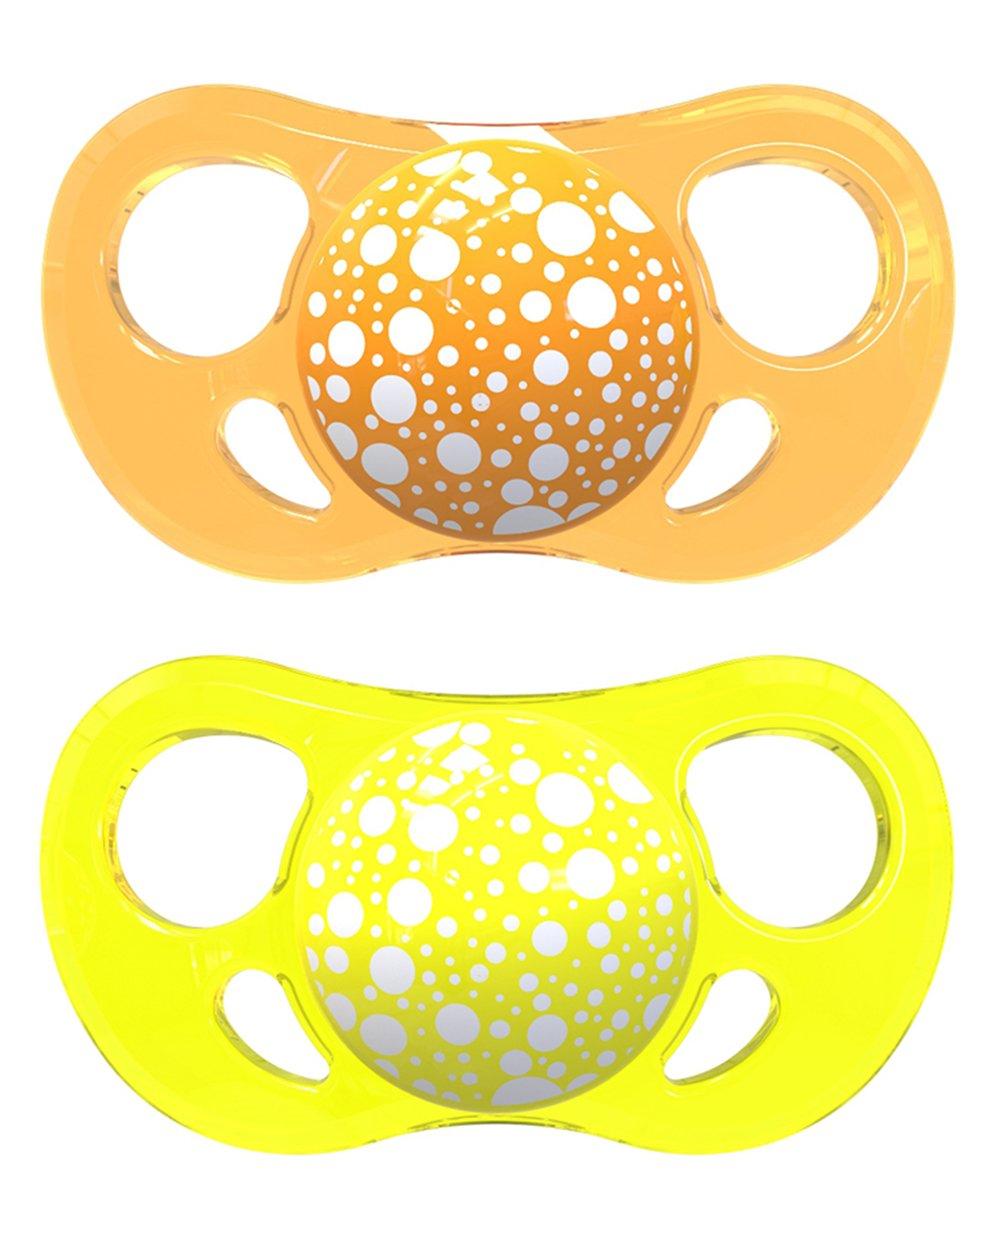 Amazon.com: twistshake 2 x Chupete 6 +, Amarillo y Naranja M ...